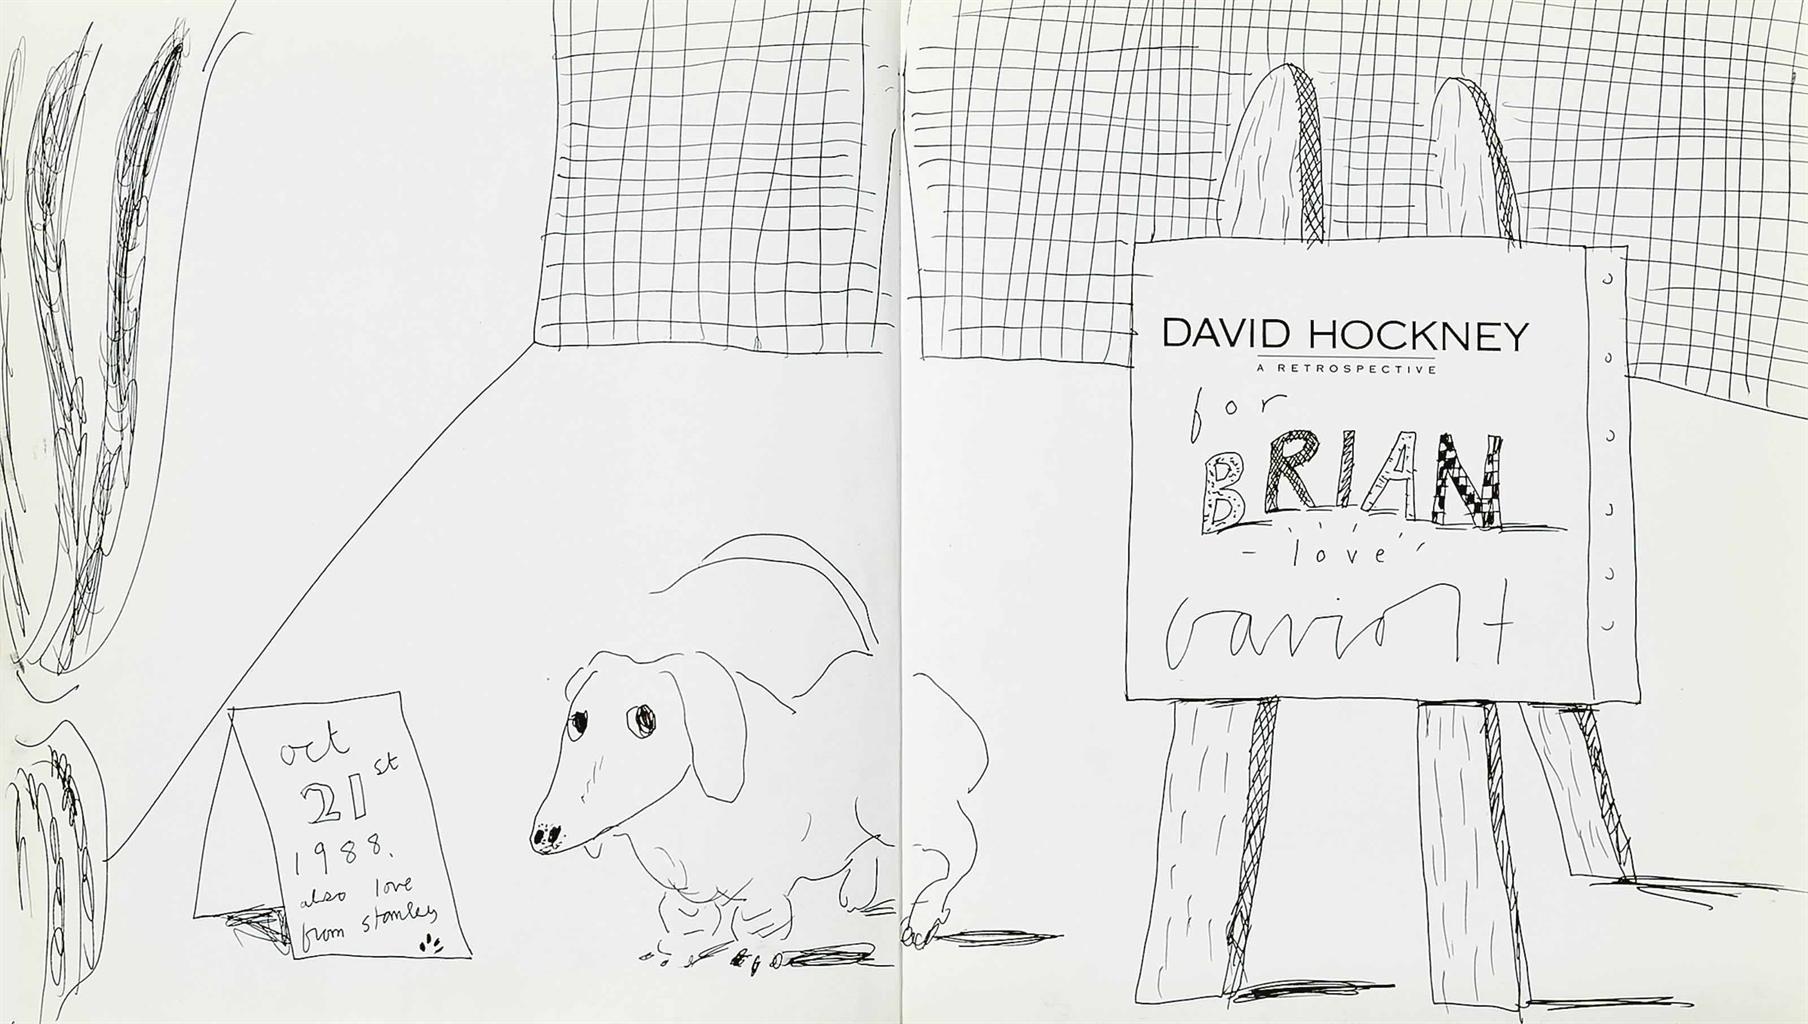 David Hockney-Stanley-1988